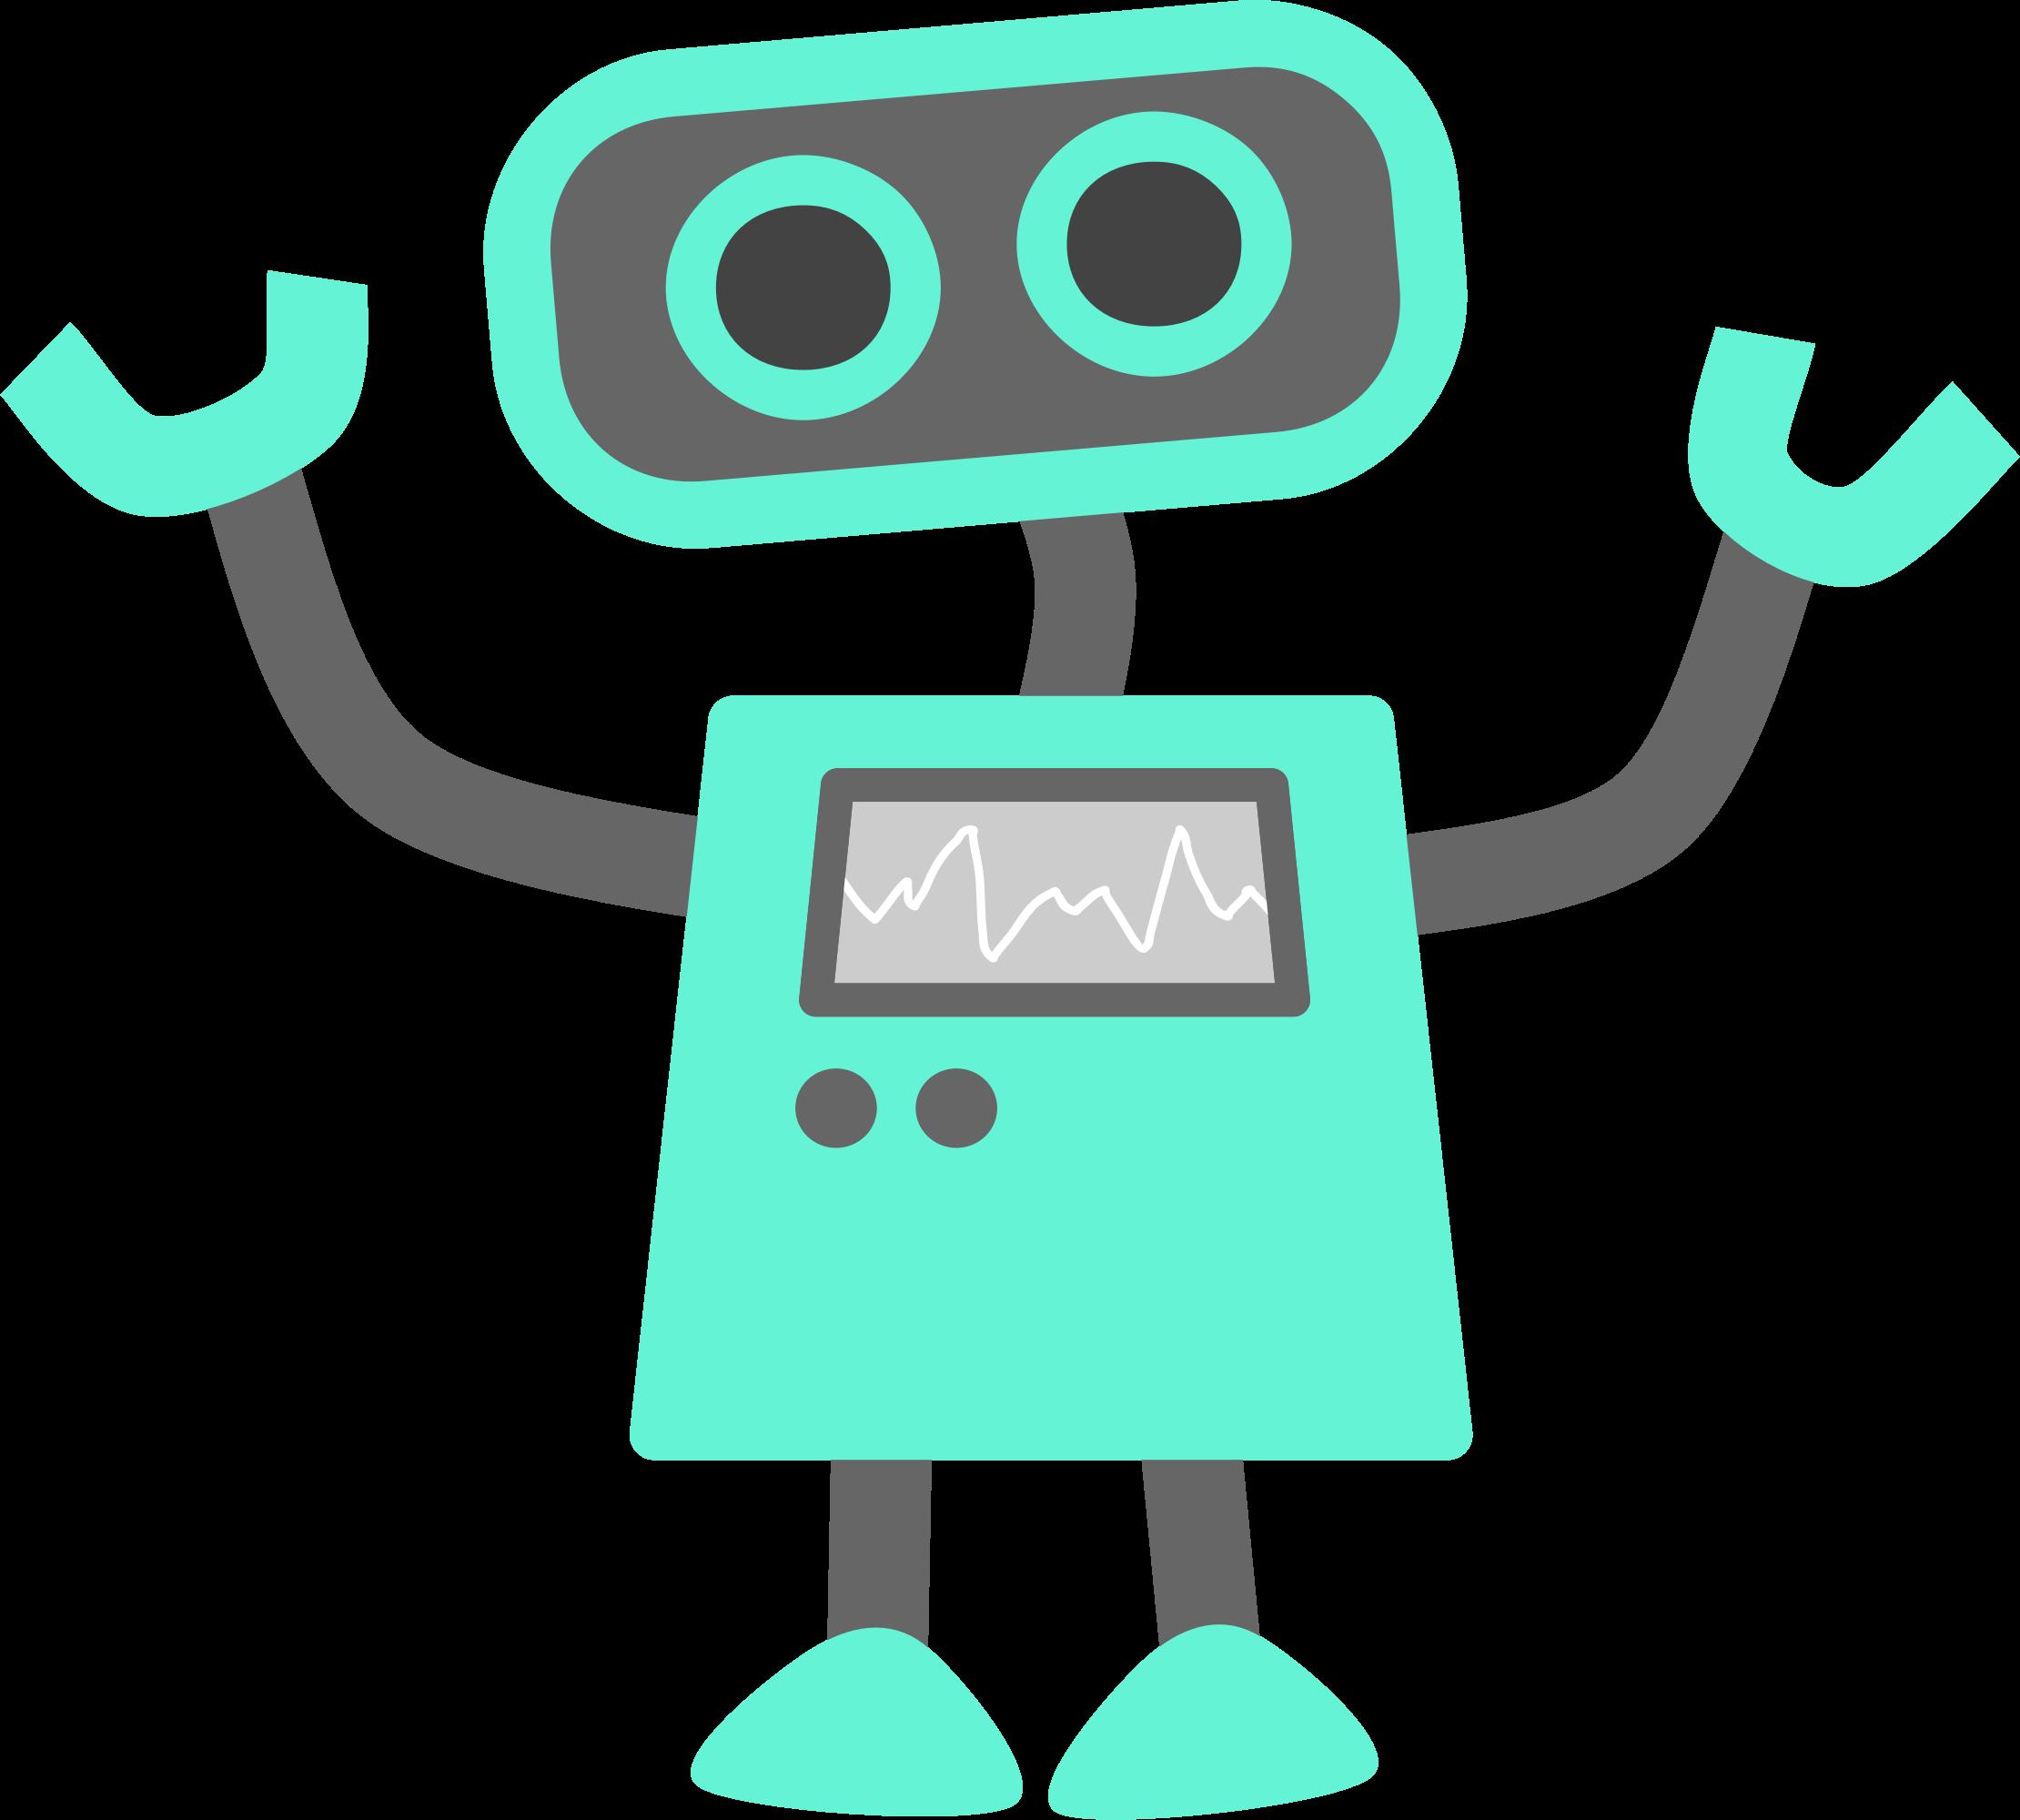 Robot clipart happy  Desktop Phone Sci Fi